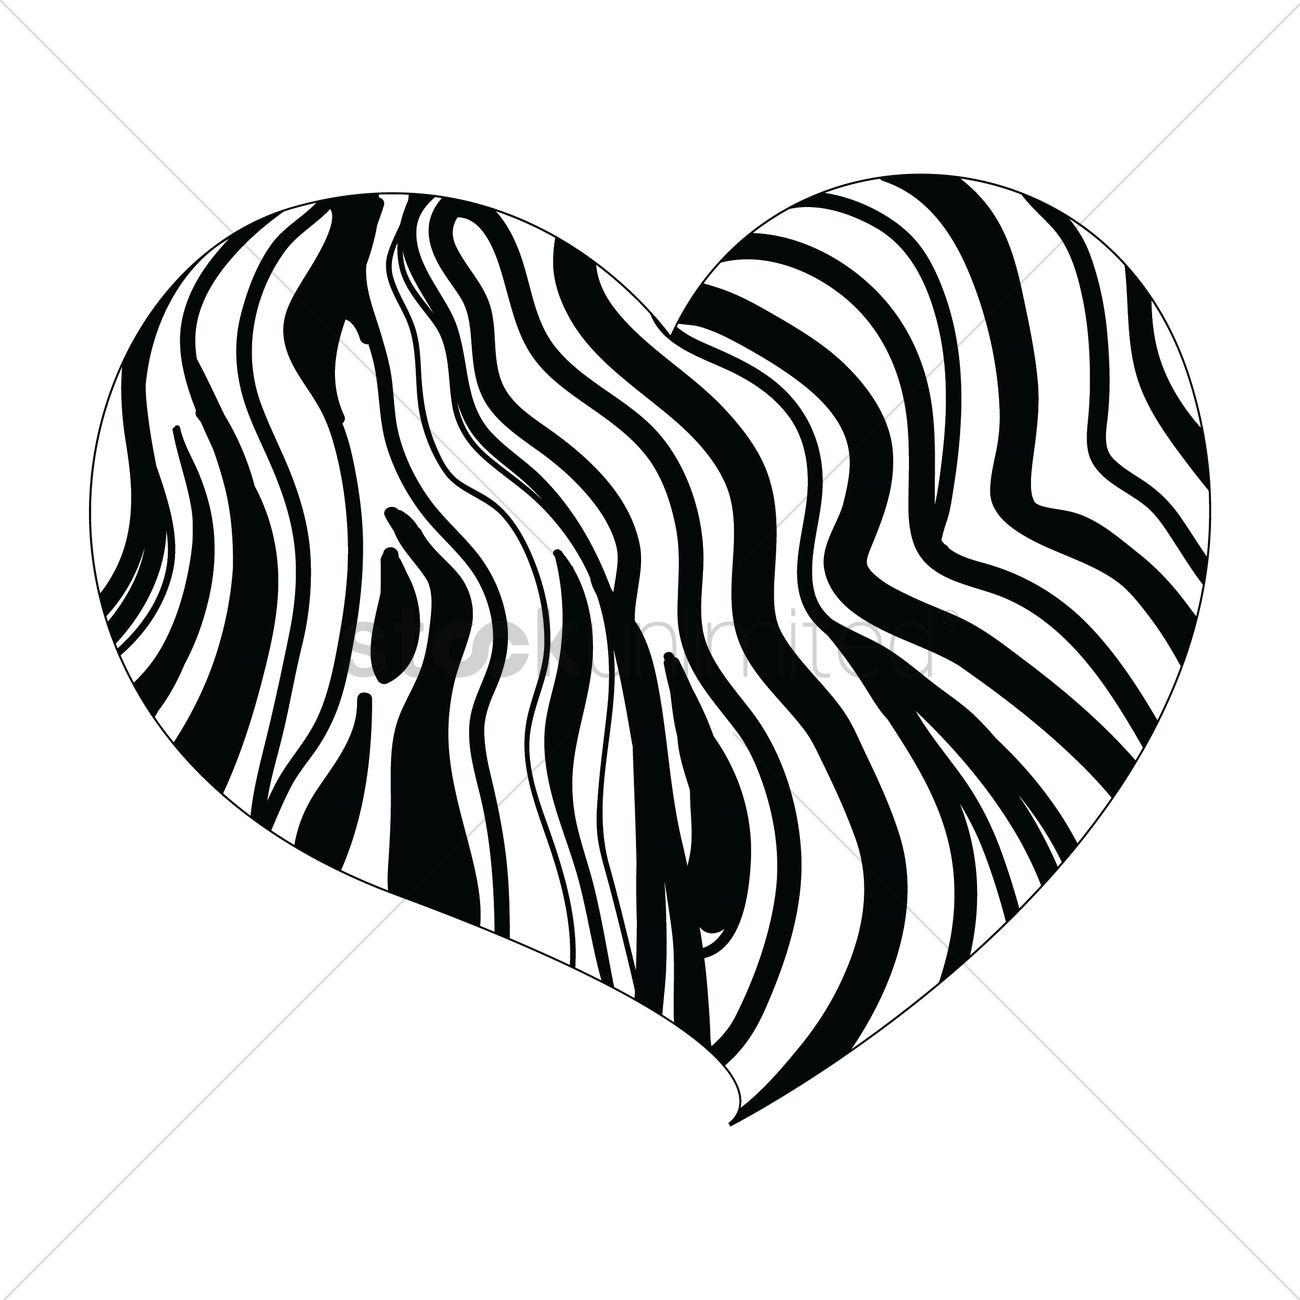 Vintage Giant Octopus Drawing Zebra Print Heart Pict...